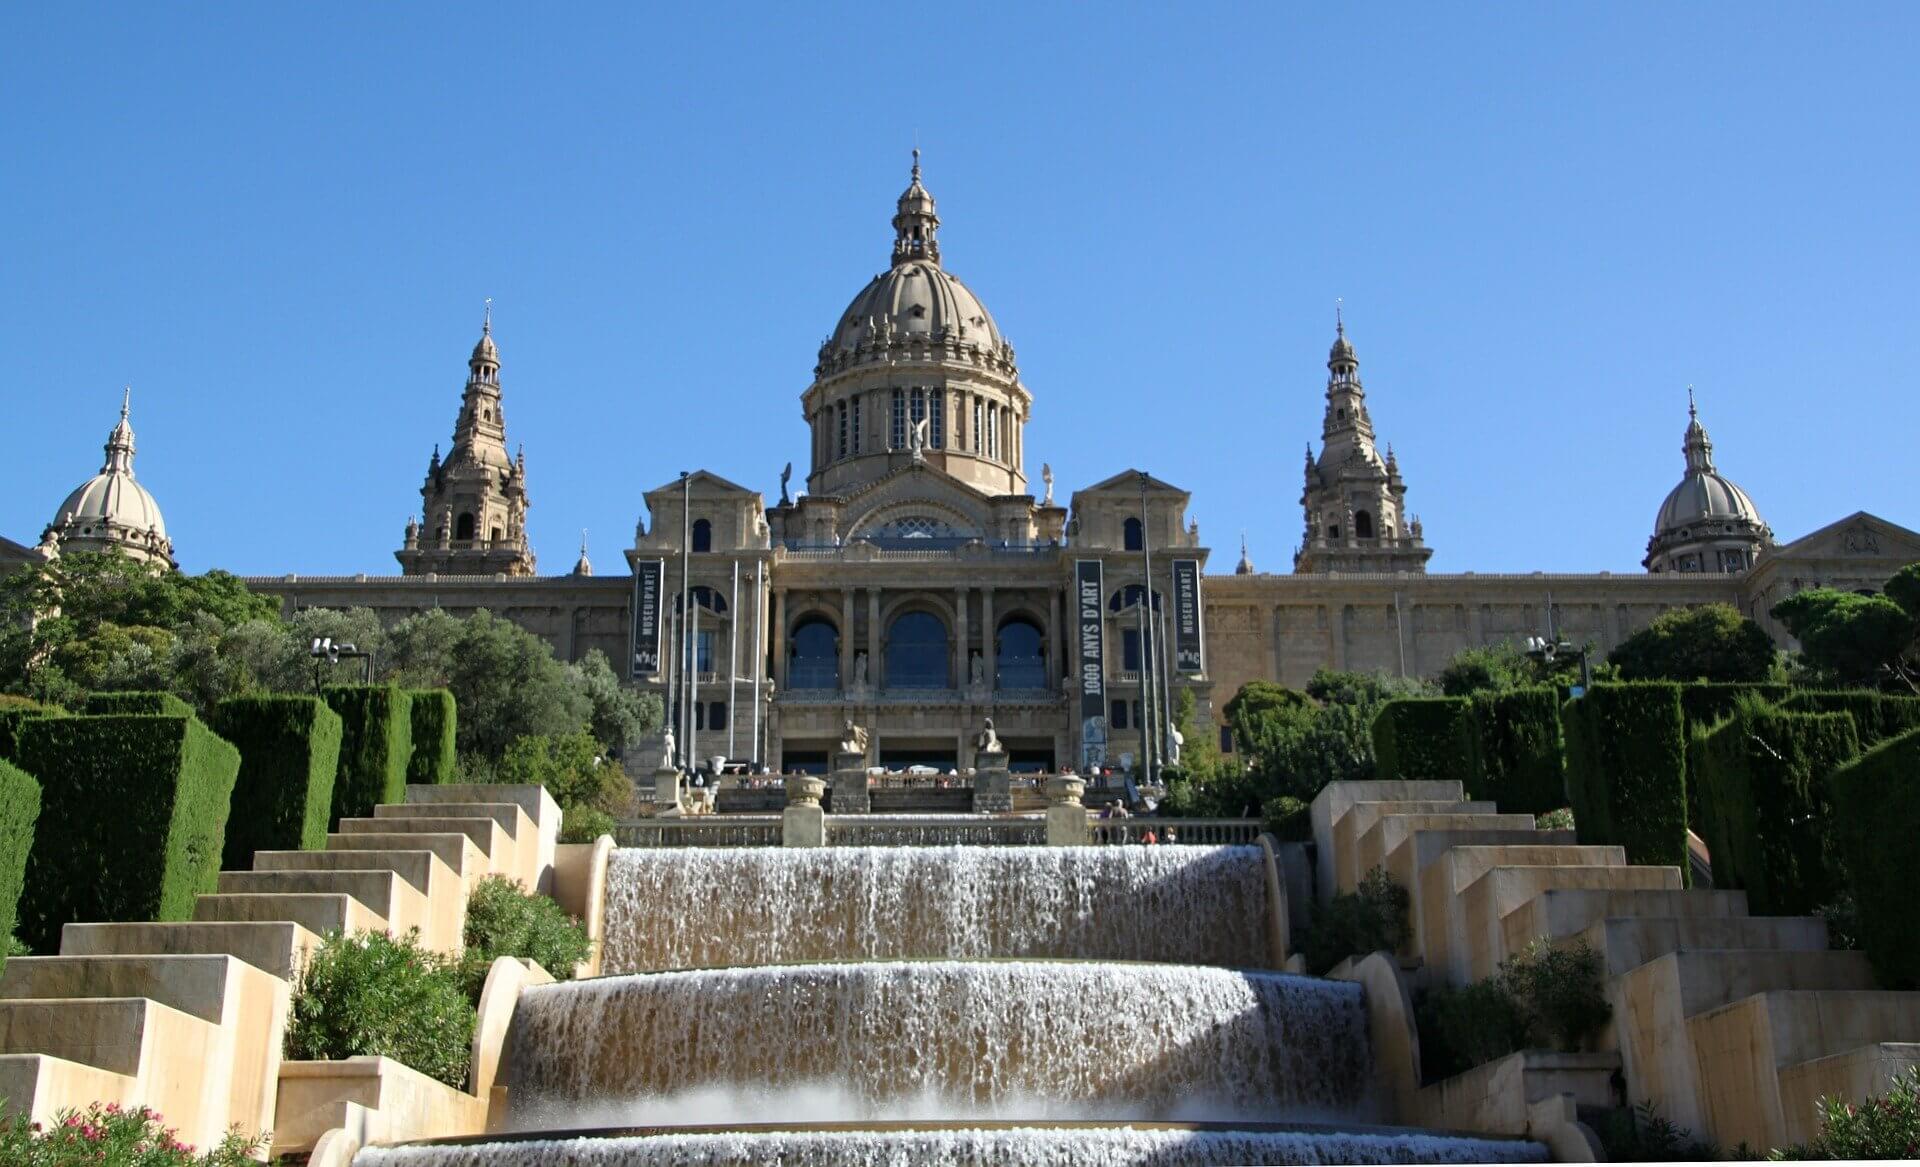 Museu Nacional d'Art de Catalunya – MNAC